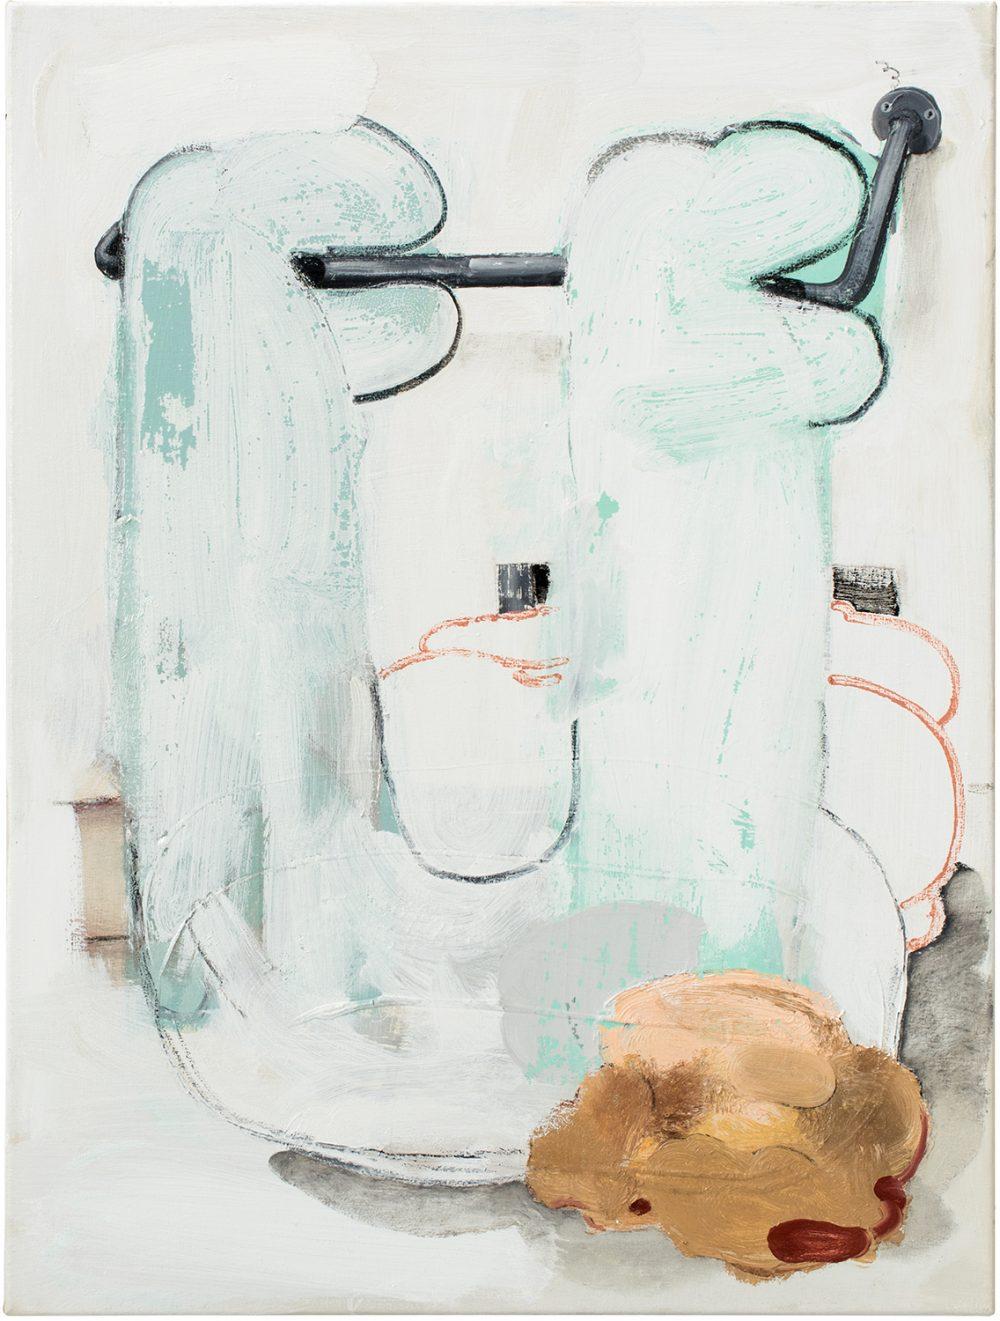 o.T. 66 (2017), Öl, Lack, Kohle auf Leinwand, 88 x 66 cm